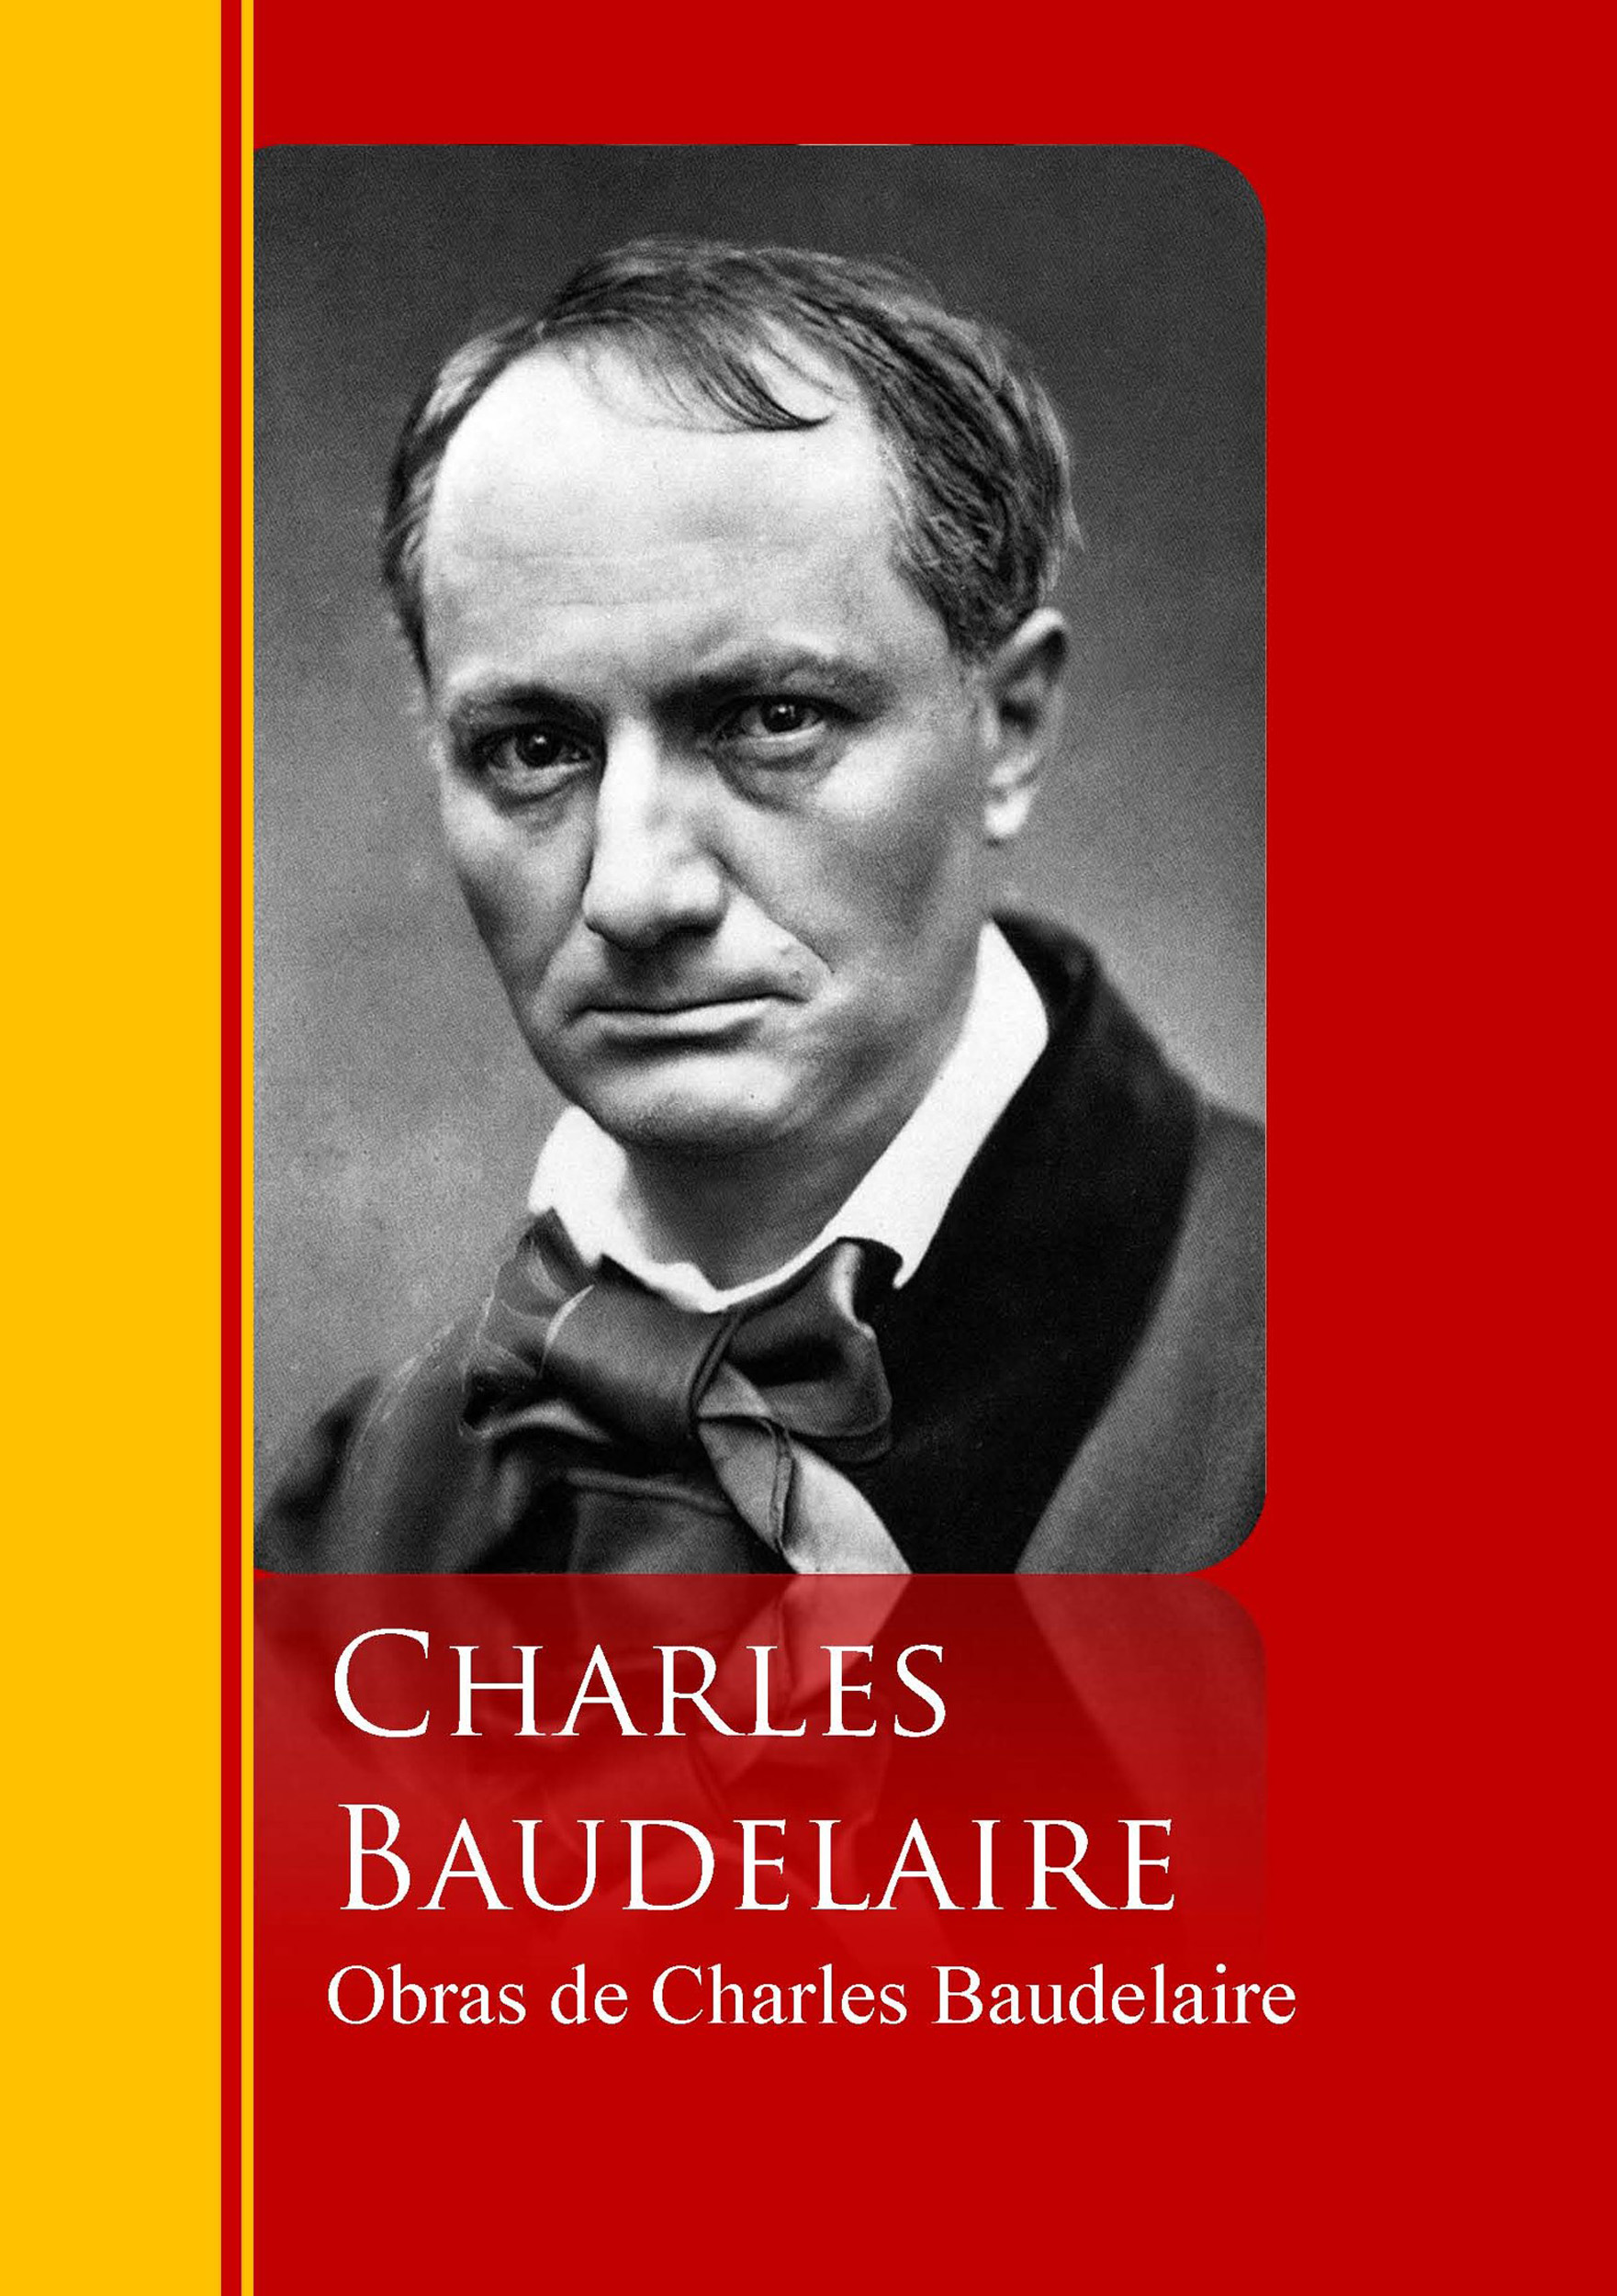 Baudelaire Charles Obras de Charles Baudelaire baudelaire charles the poems and prose poems of charles baudelaire